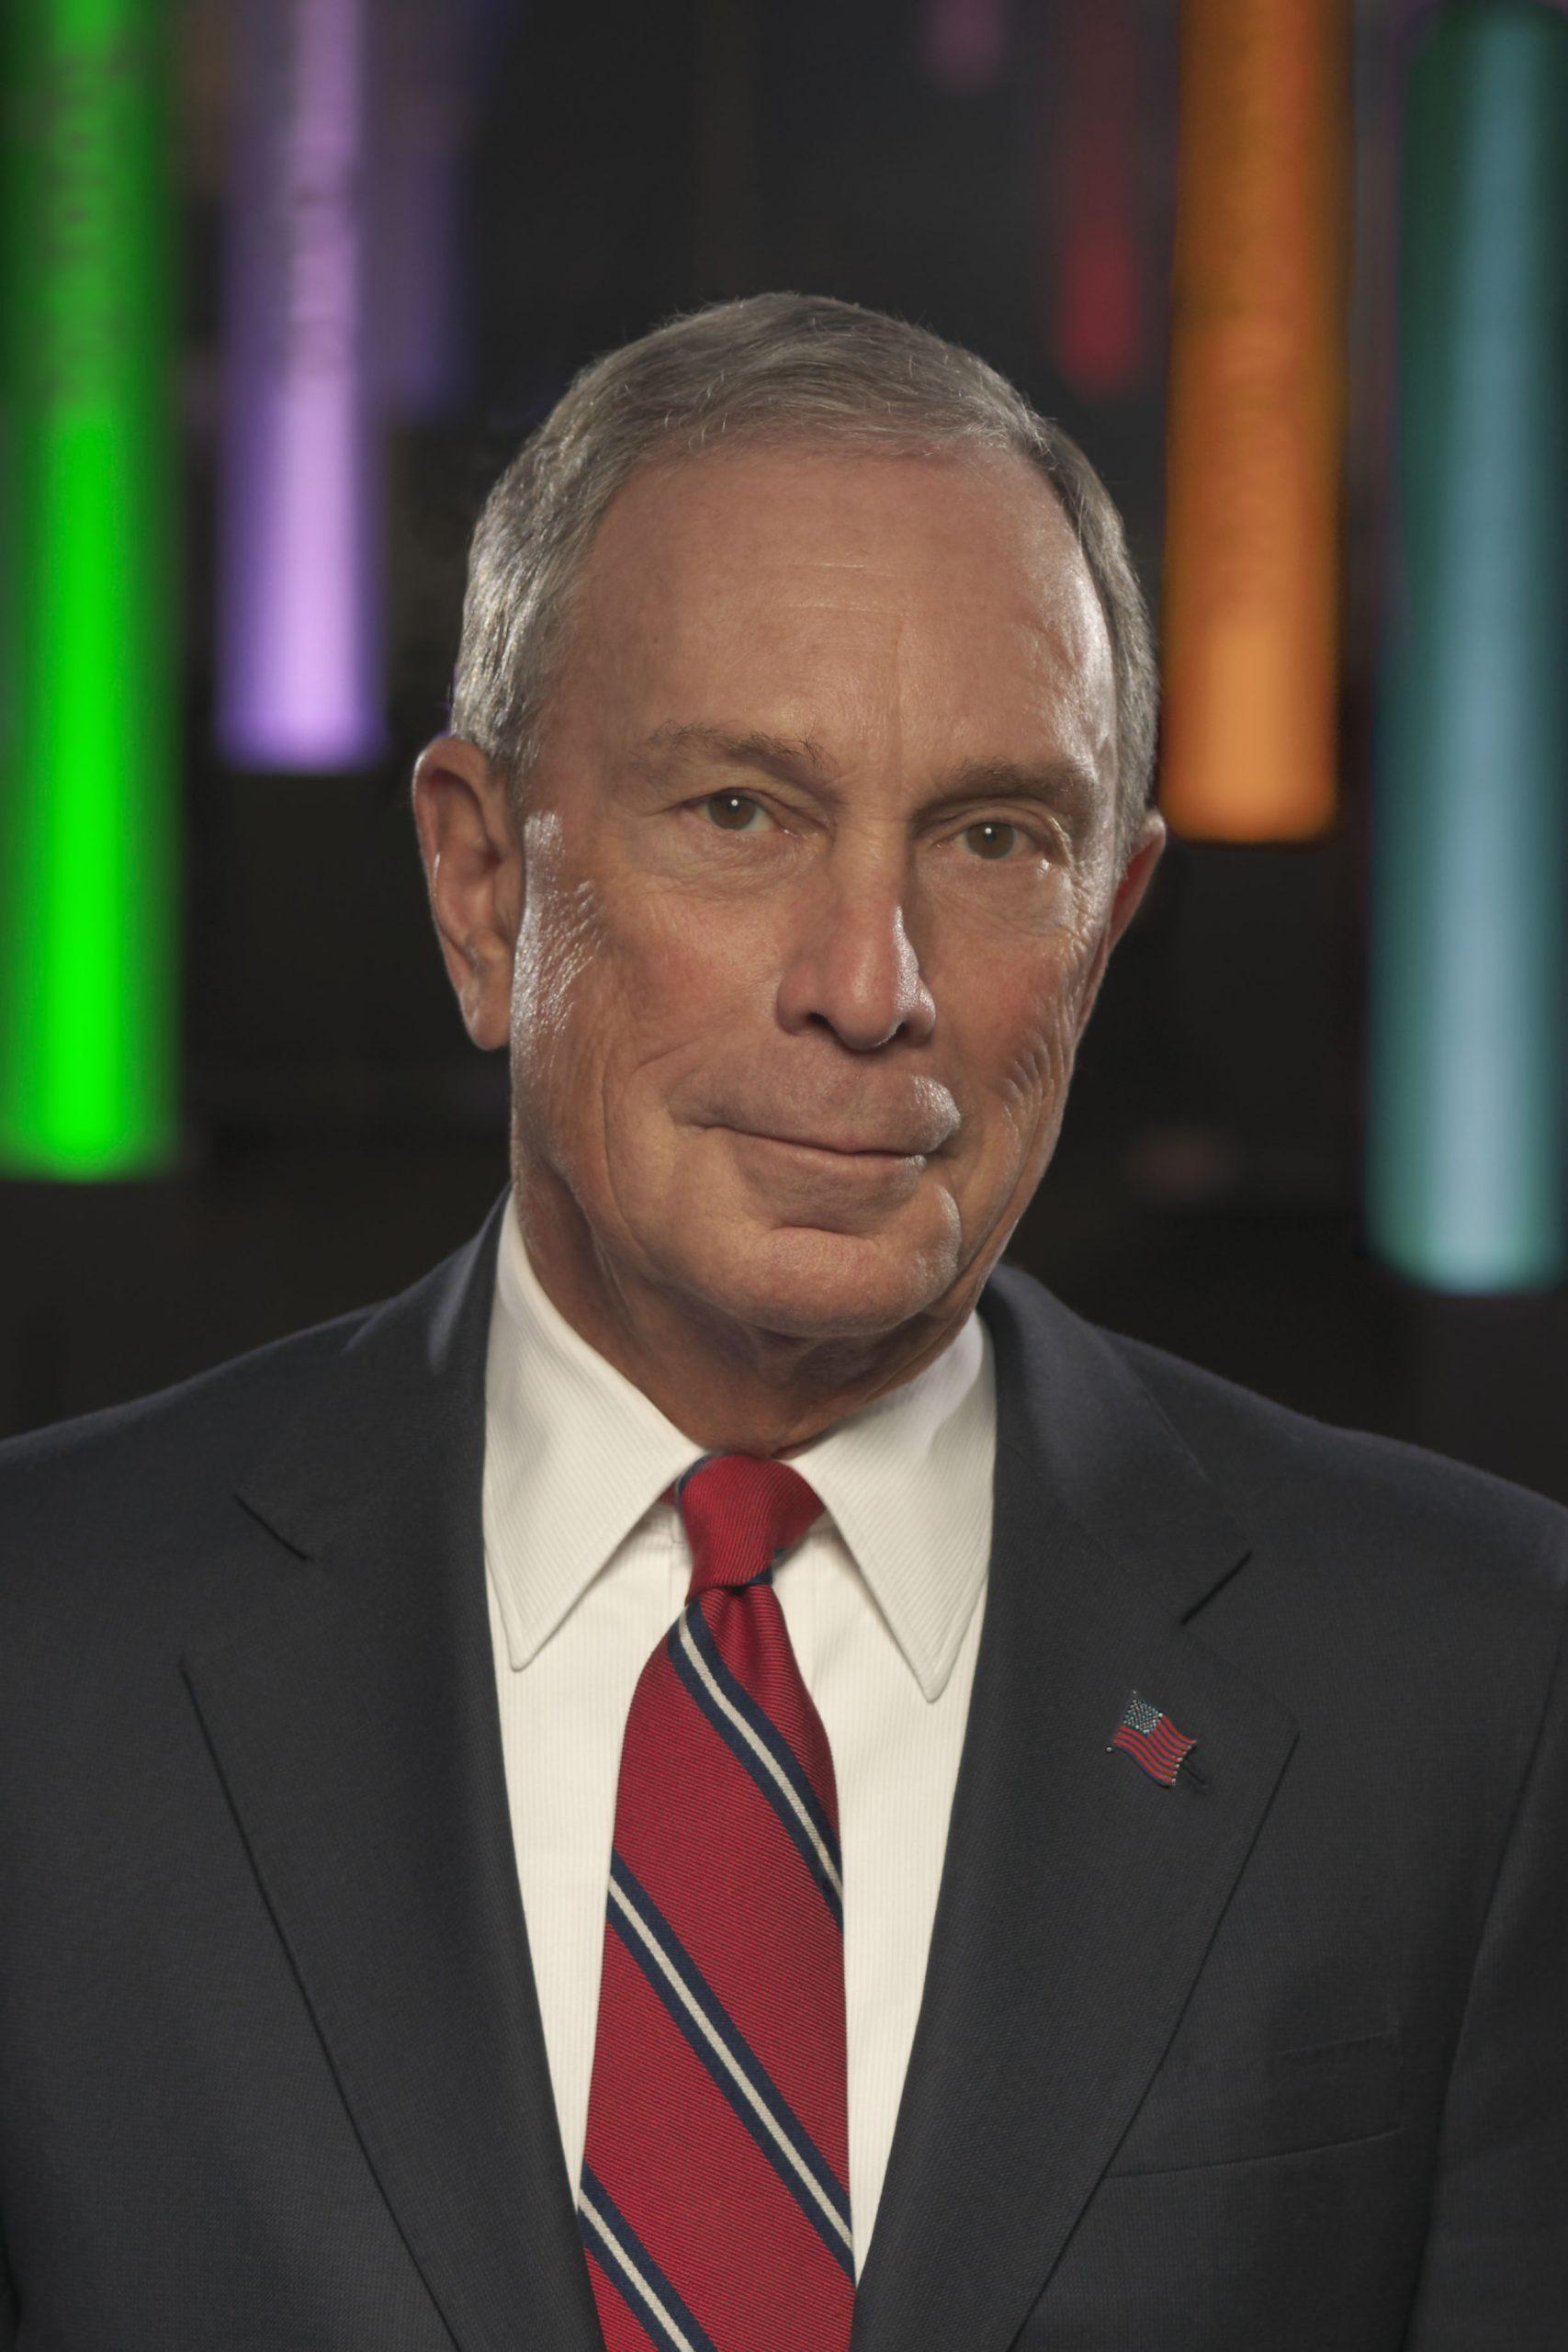 Mike Bloomberg headshot